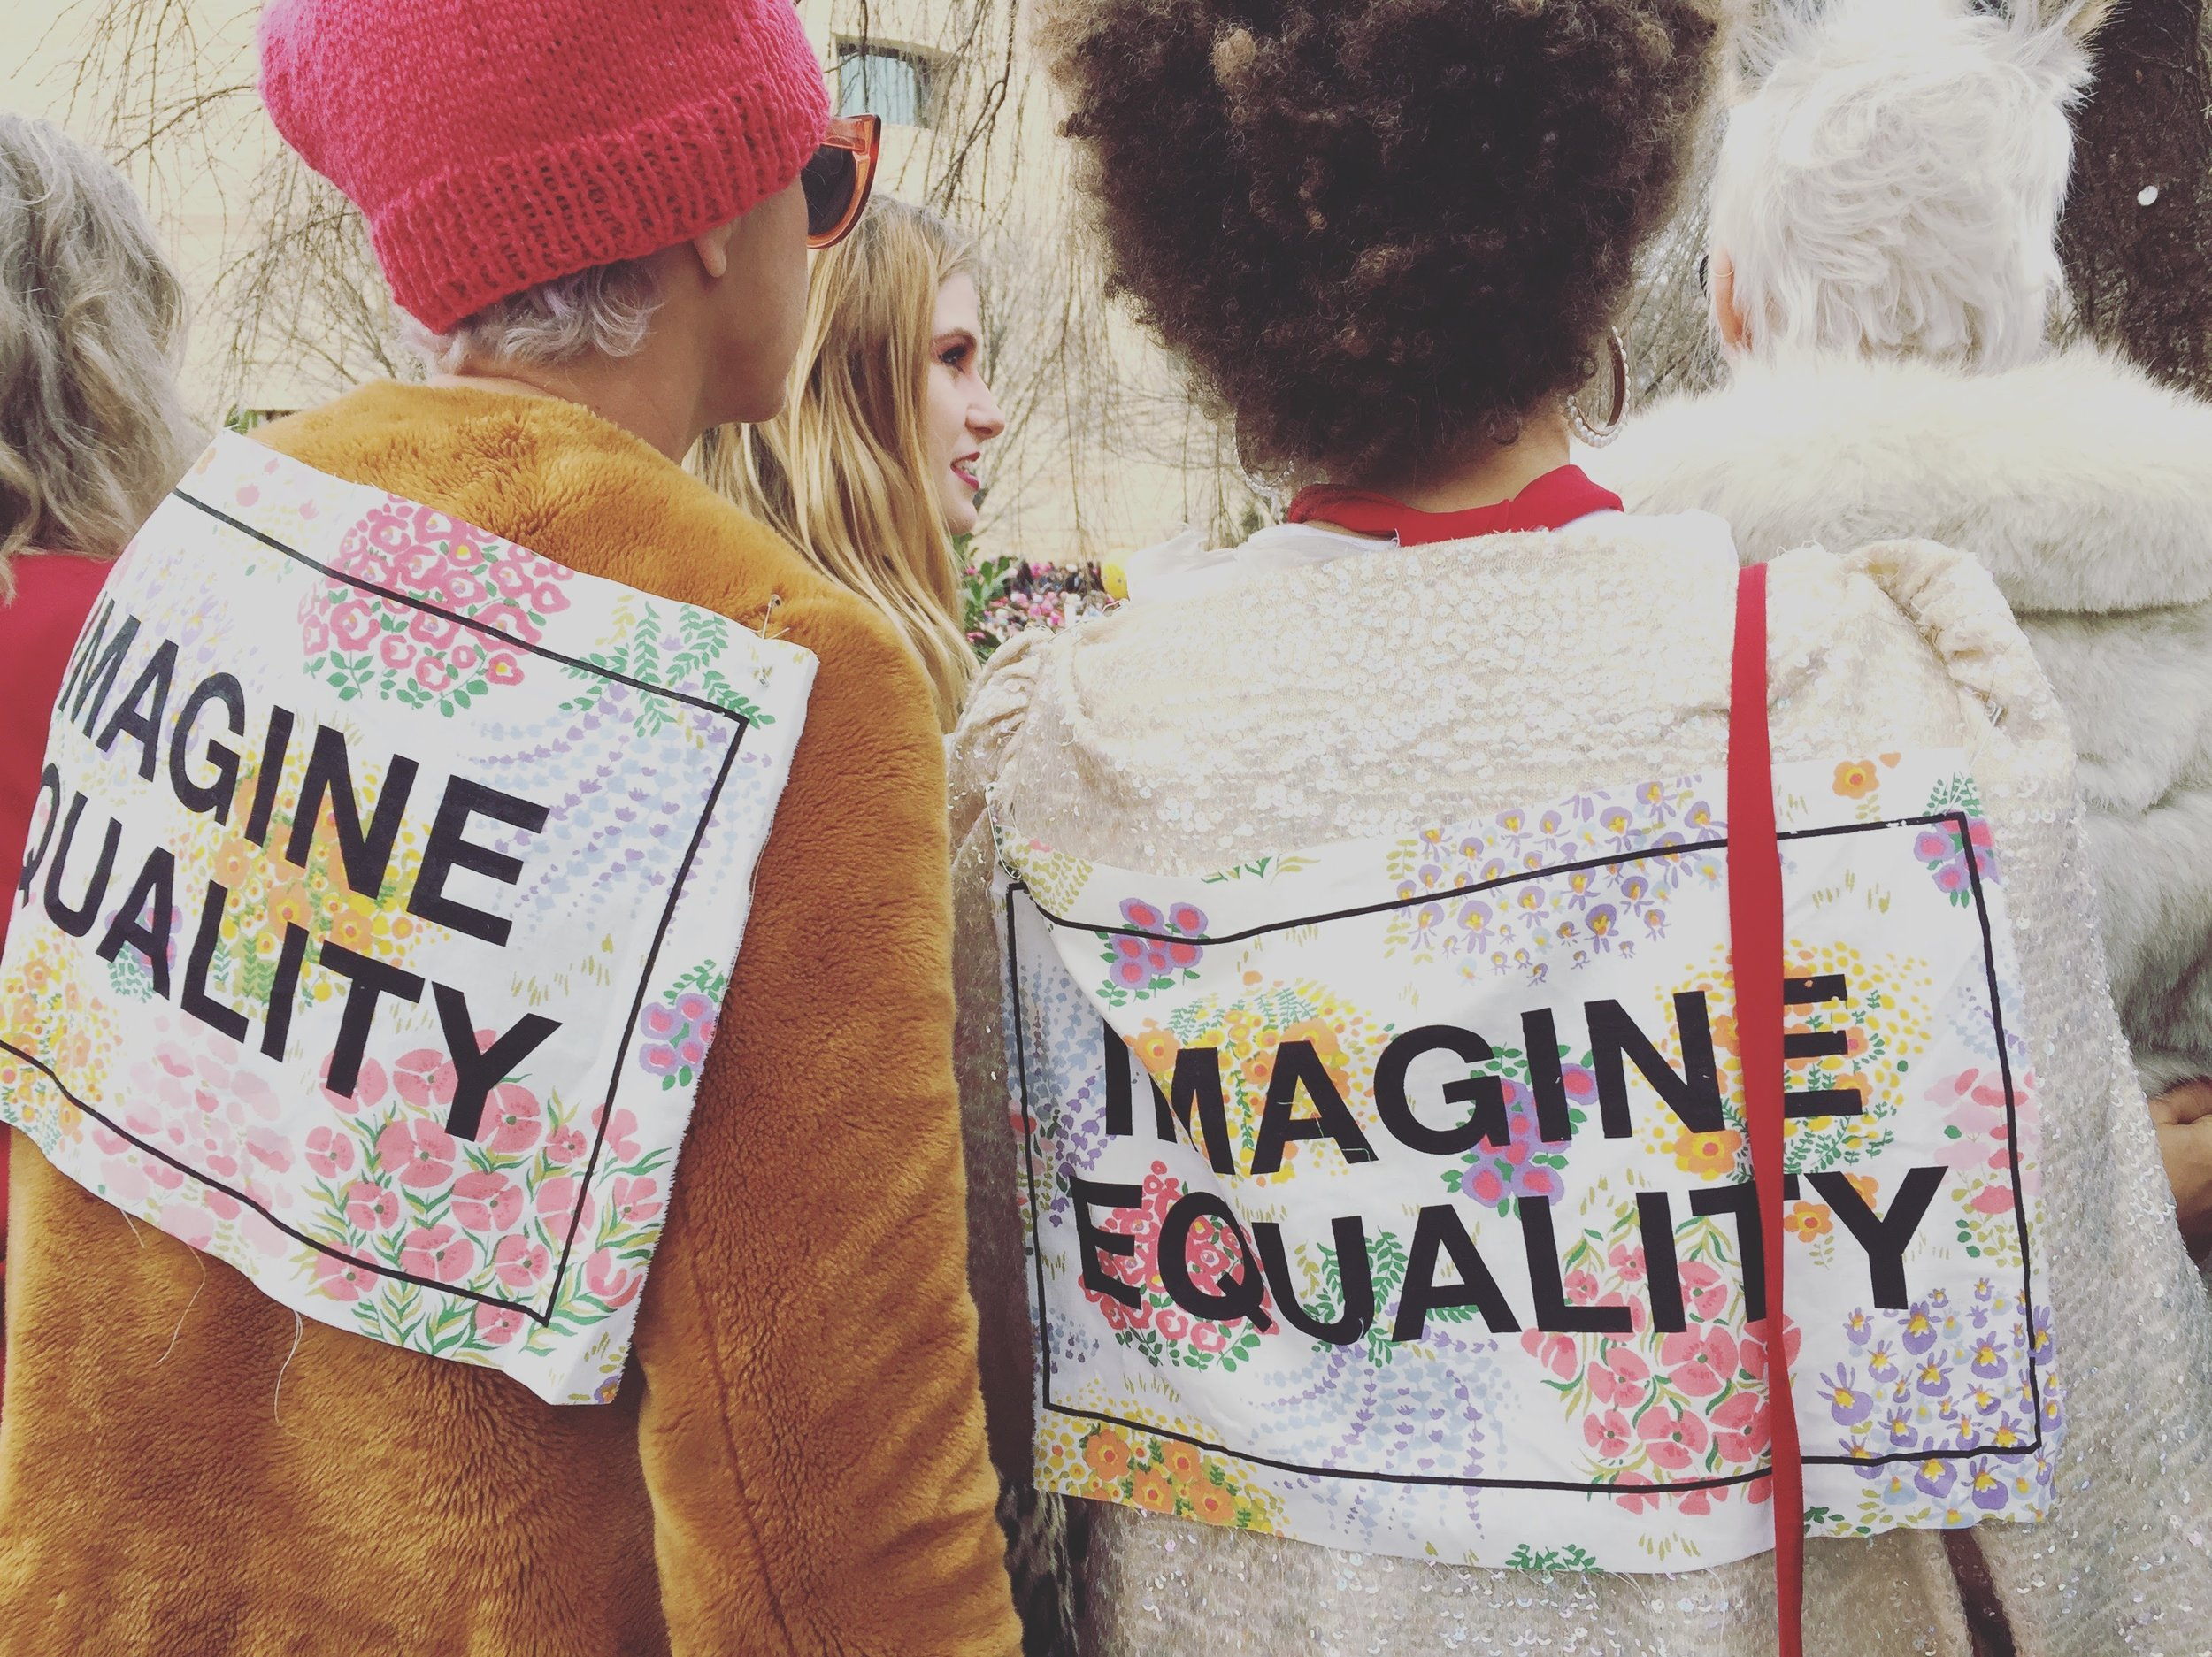 Imagine equality.(Photo by author, Women's March on Washington, 2017)